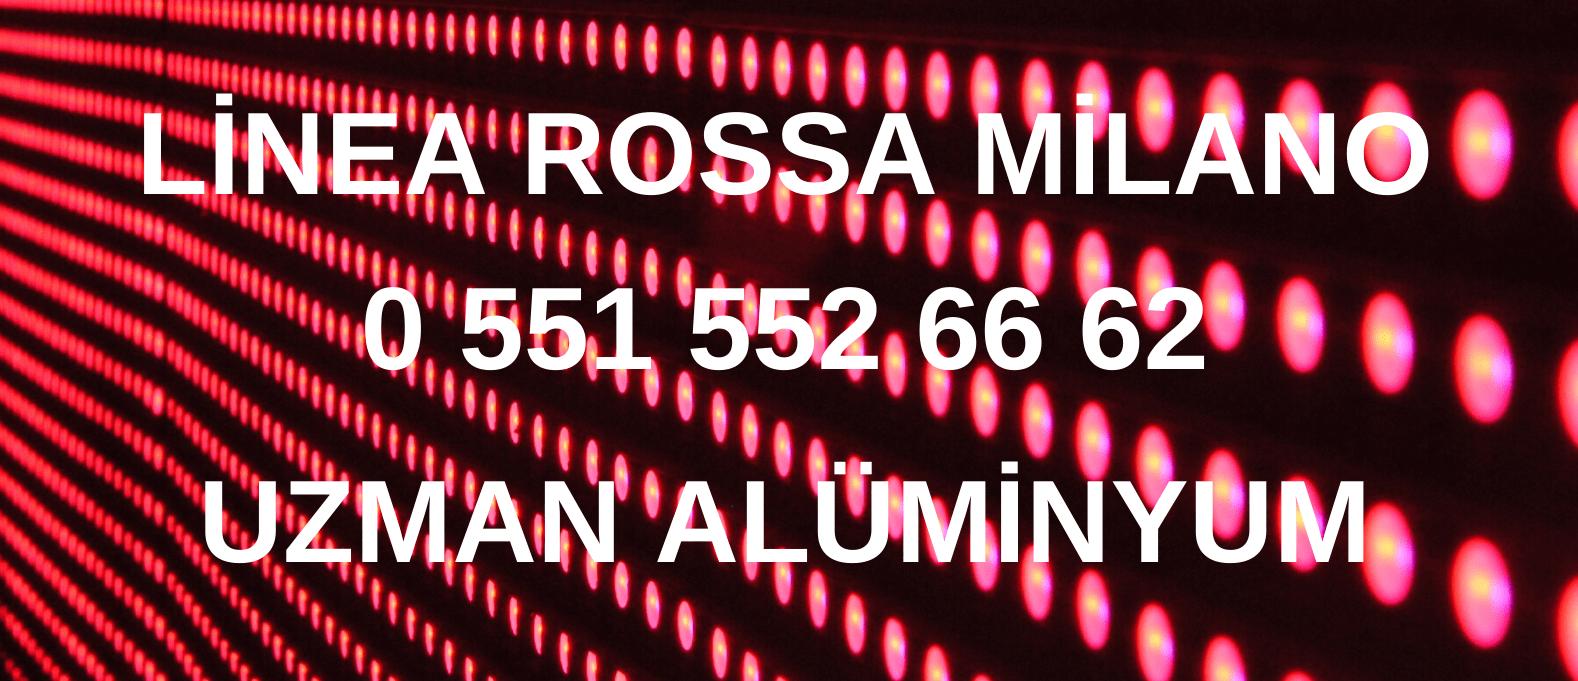 Linea Rossa Milano iletişim İzmir